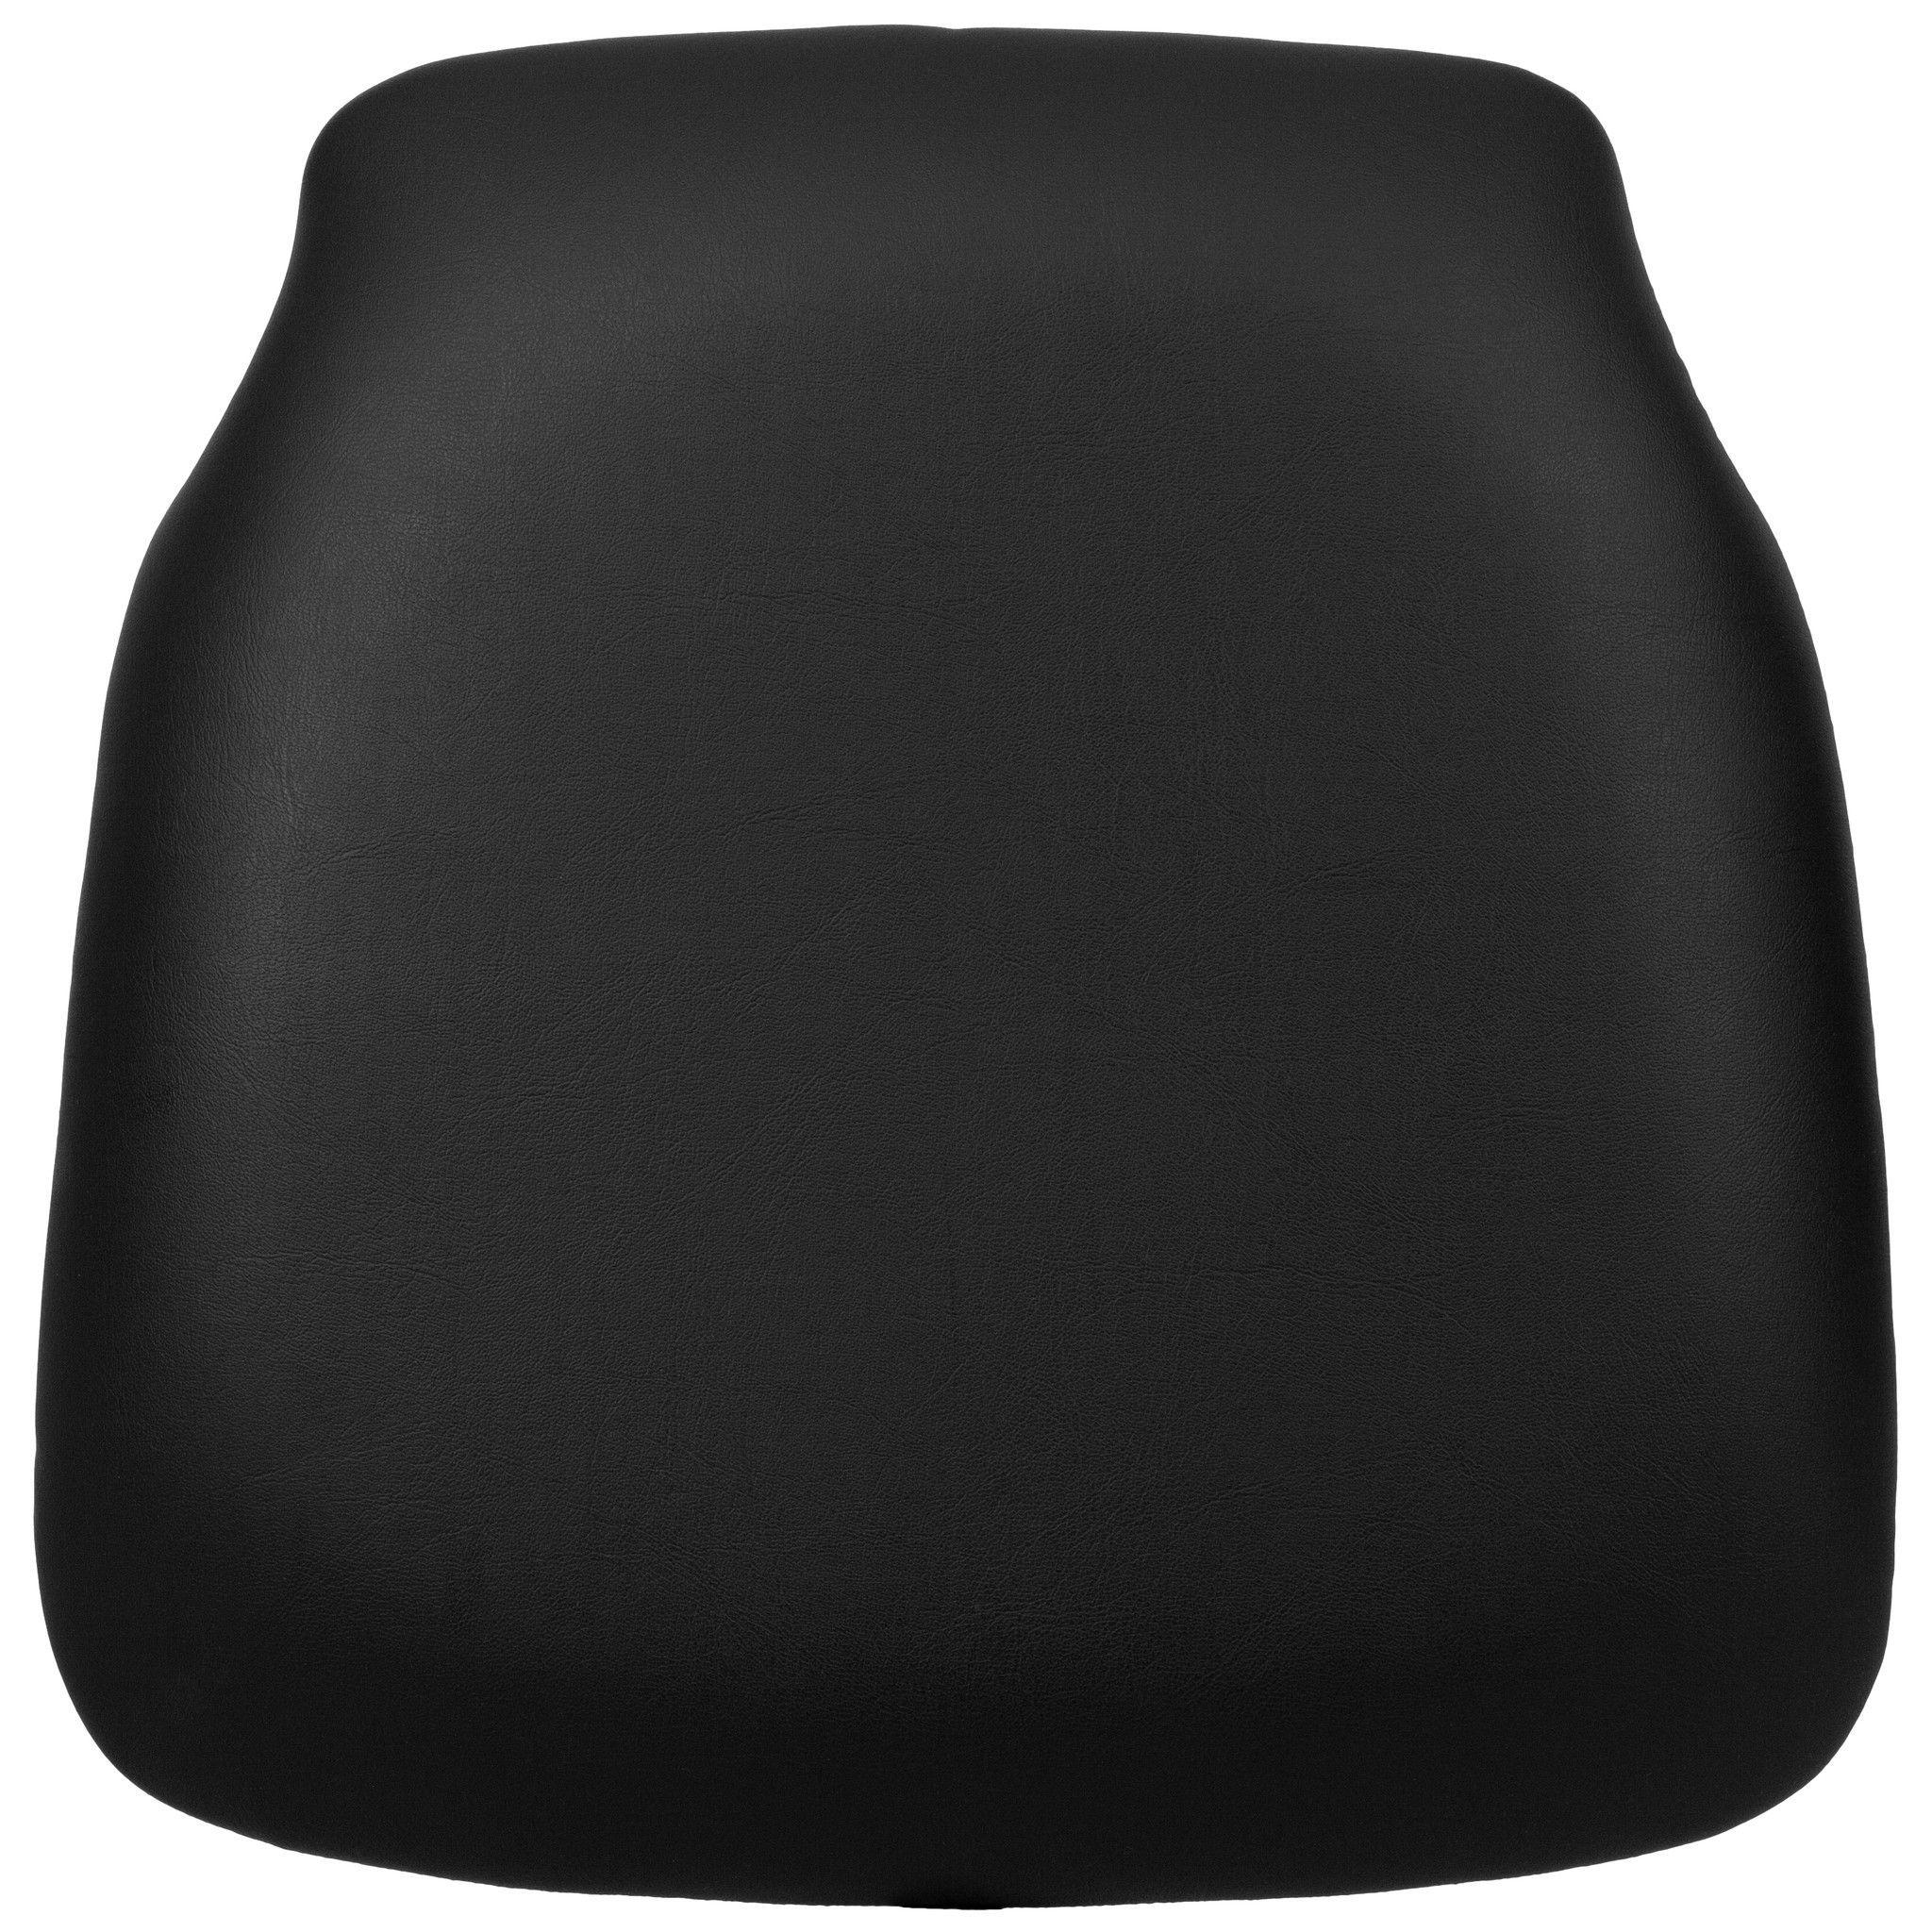 Chiavari chair cushion szblackhdgg products pinterest